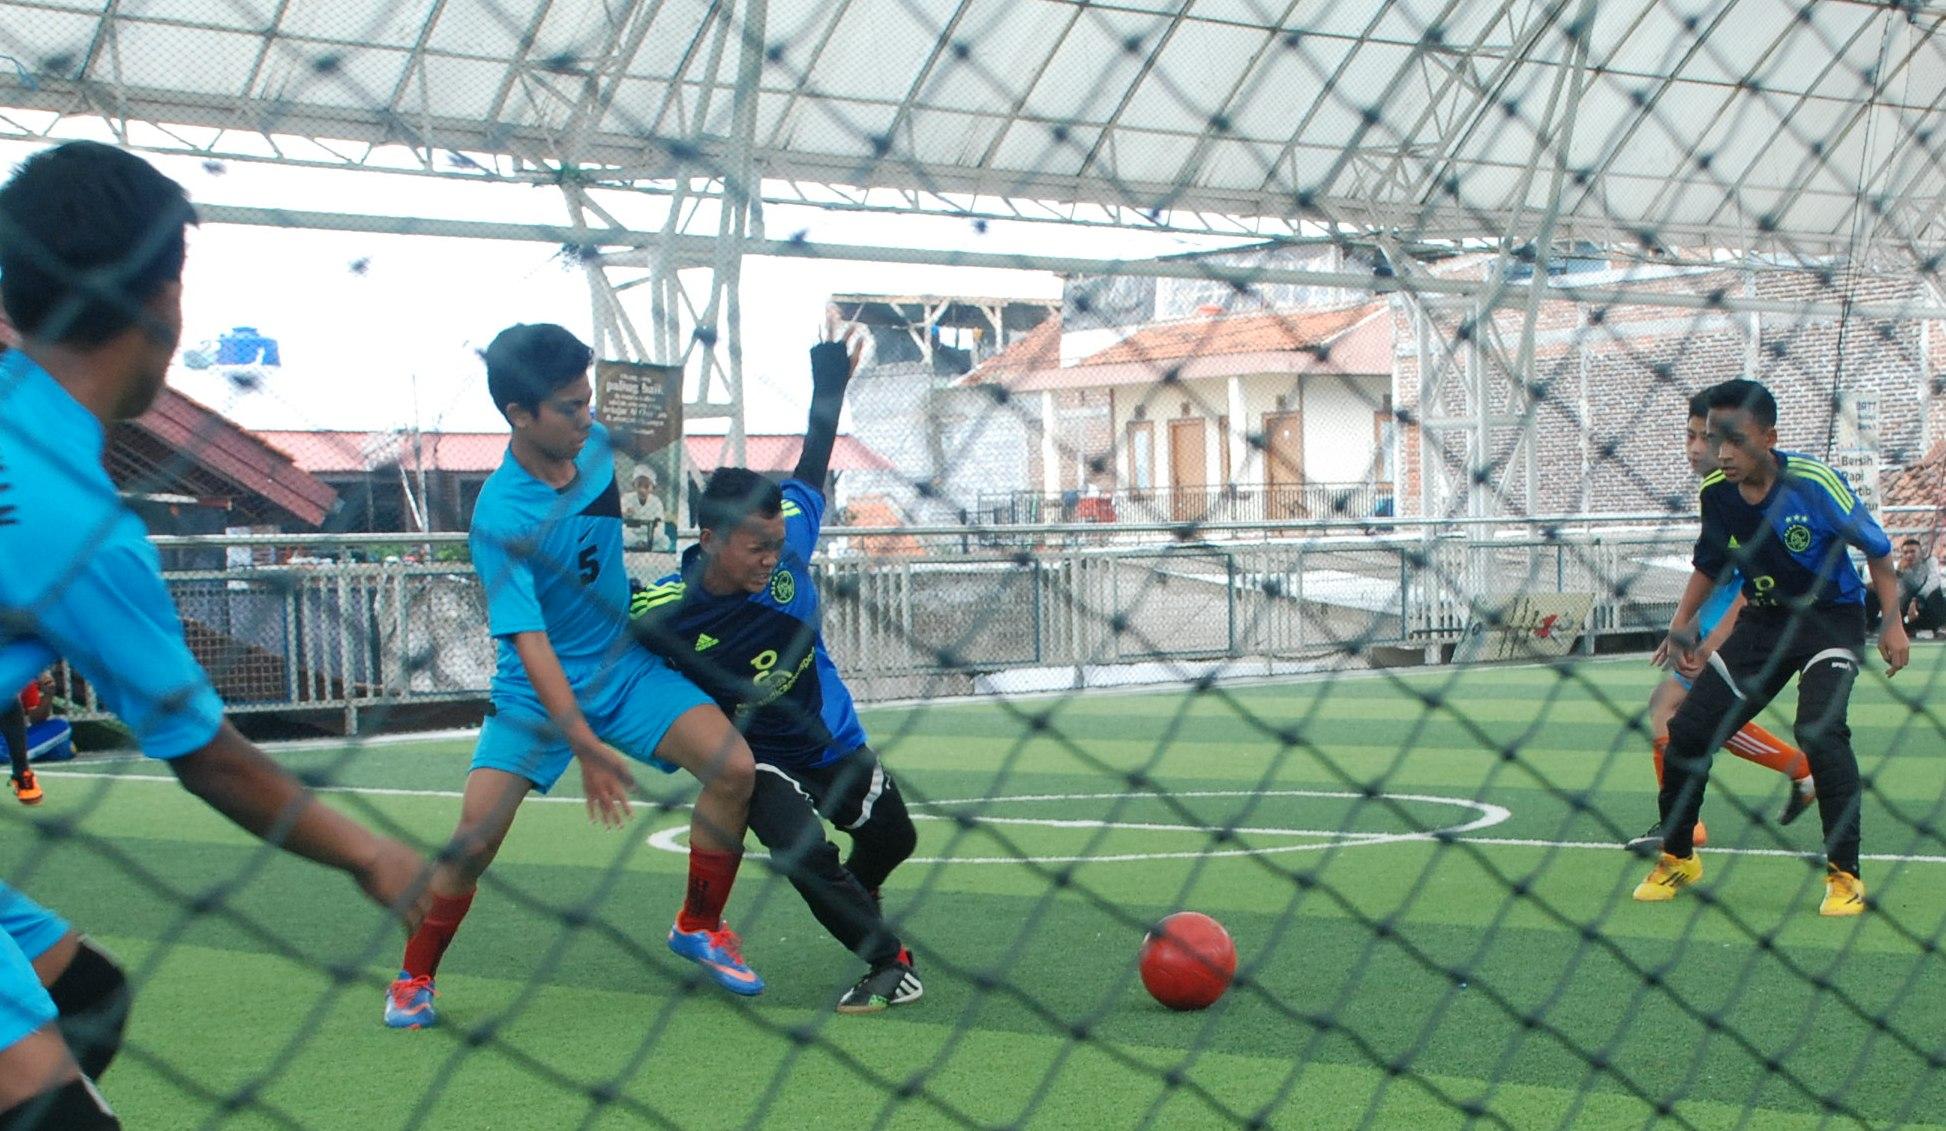 Ramaikan Milad Daarut Tauhiid, SMP DTBS Ikuti Kejuaraan Futsal